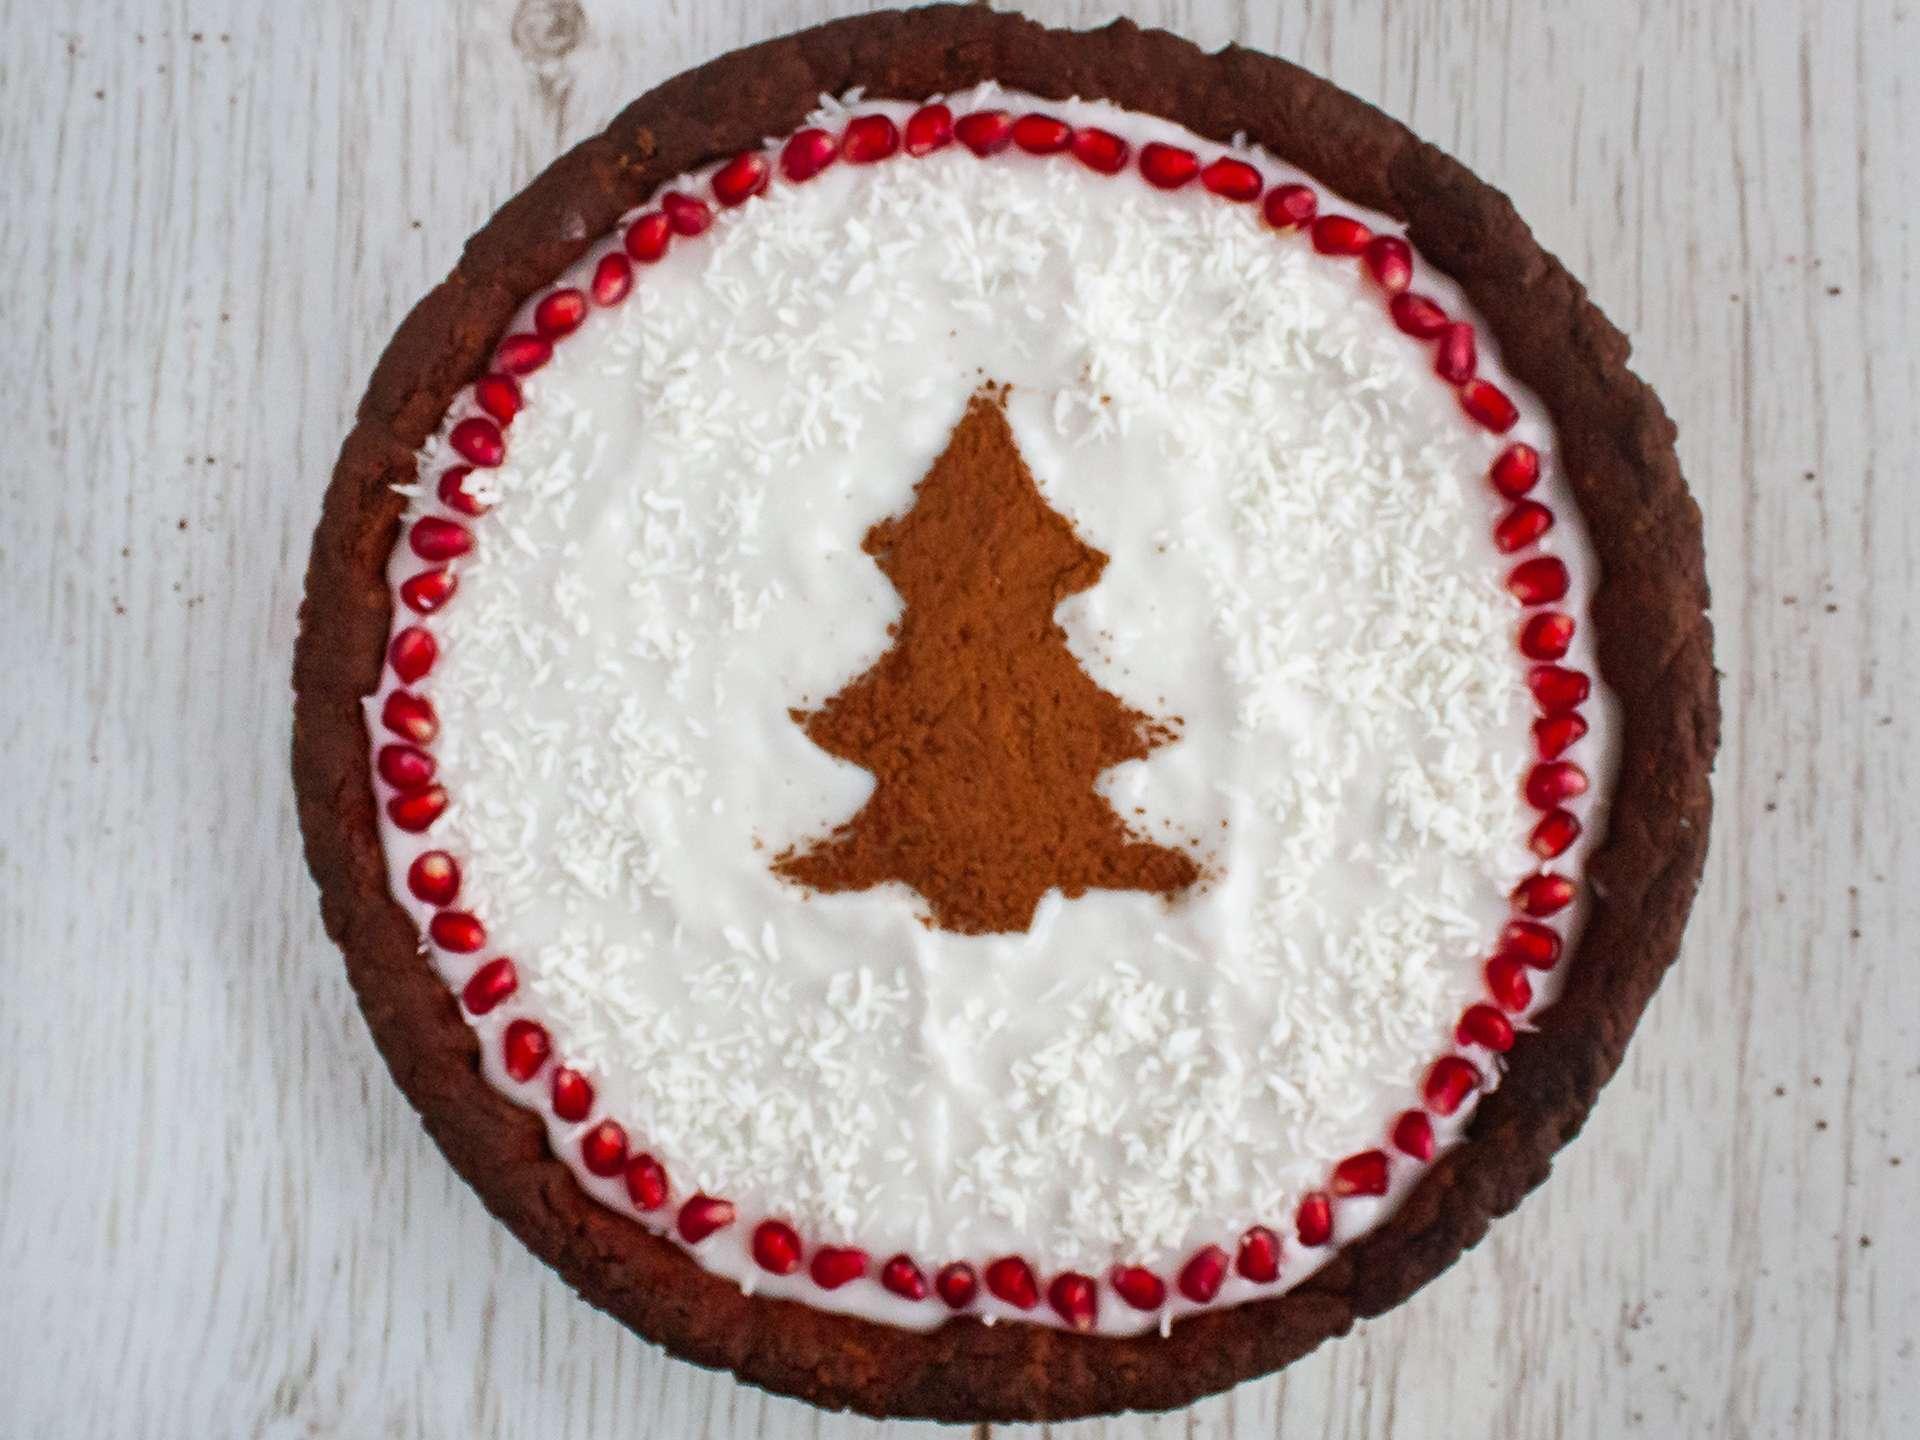 Step 5.2 of Chocolate Pomegranate Cake with Coconut Cream